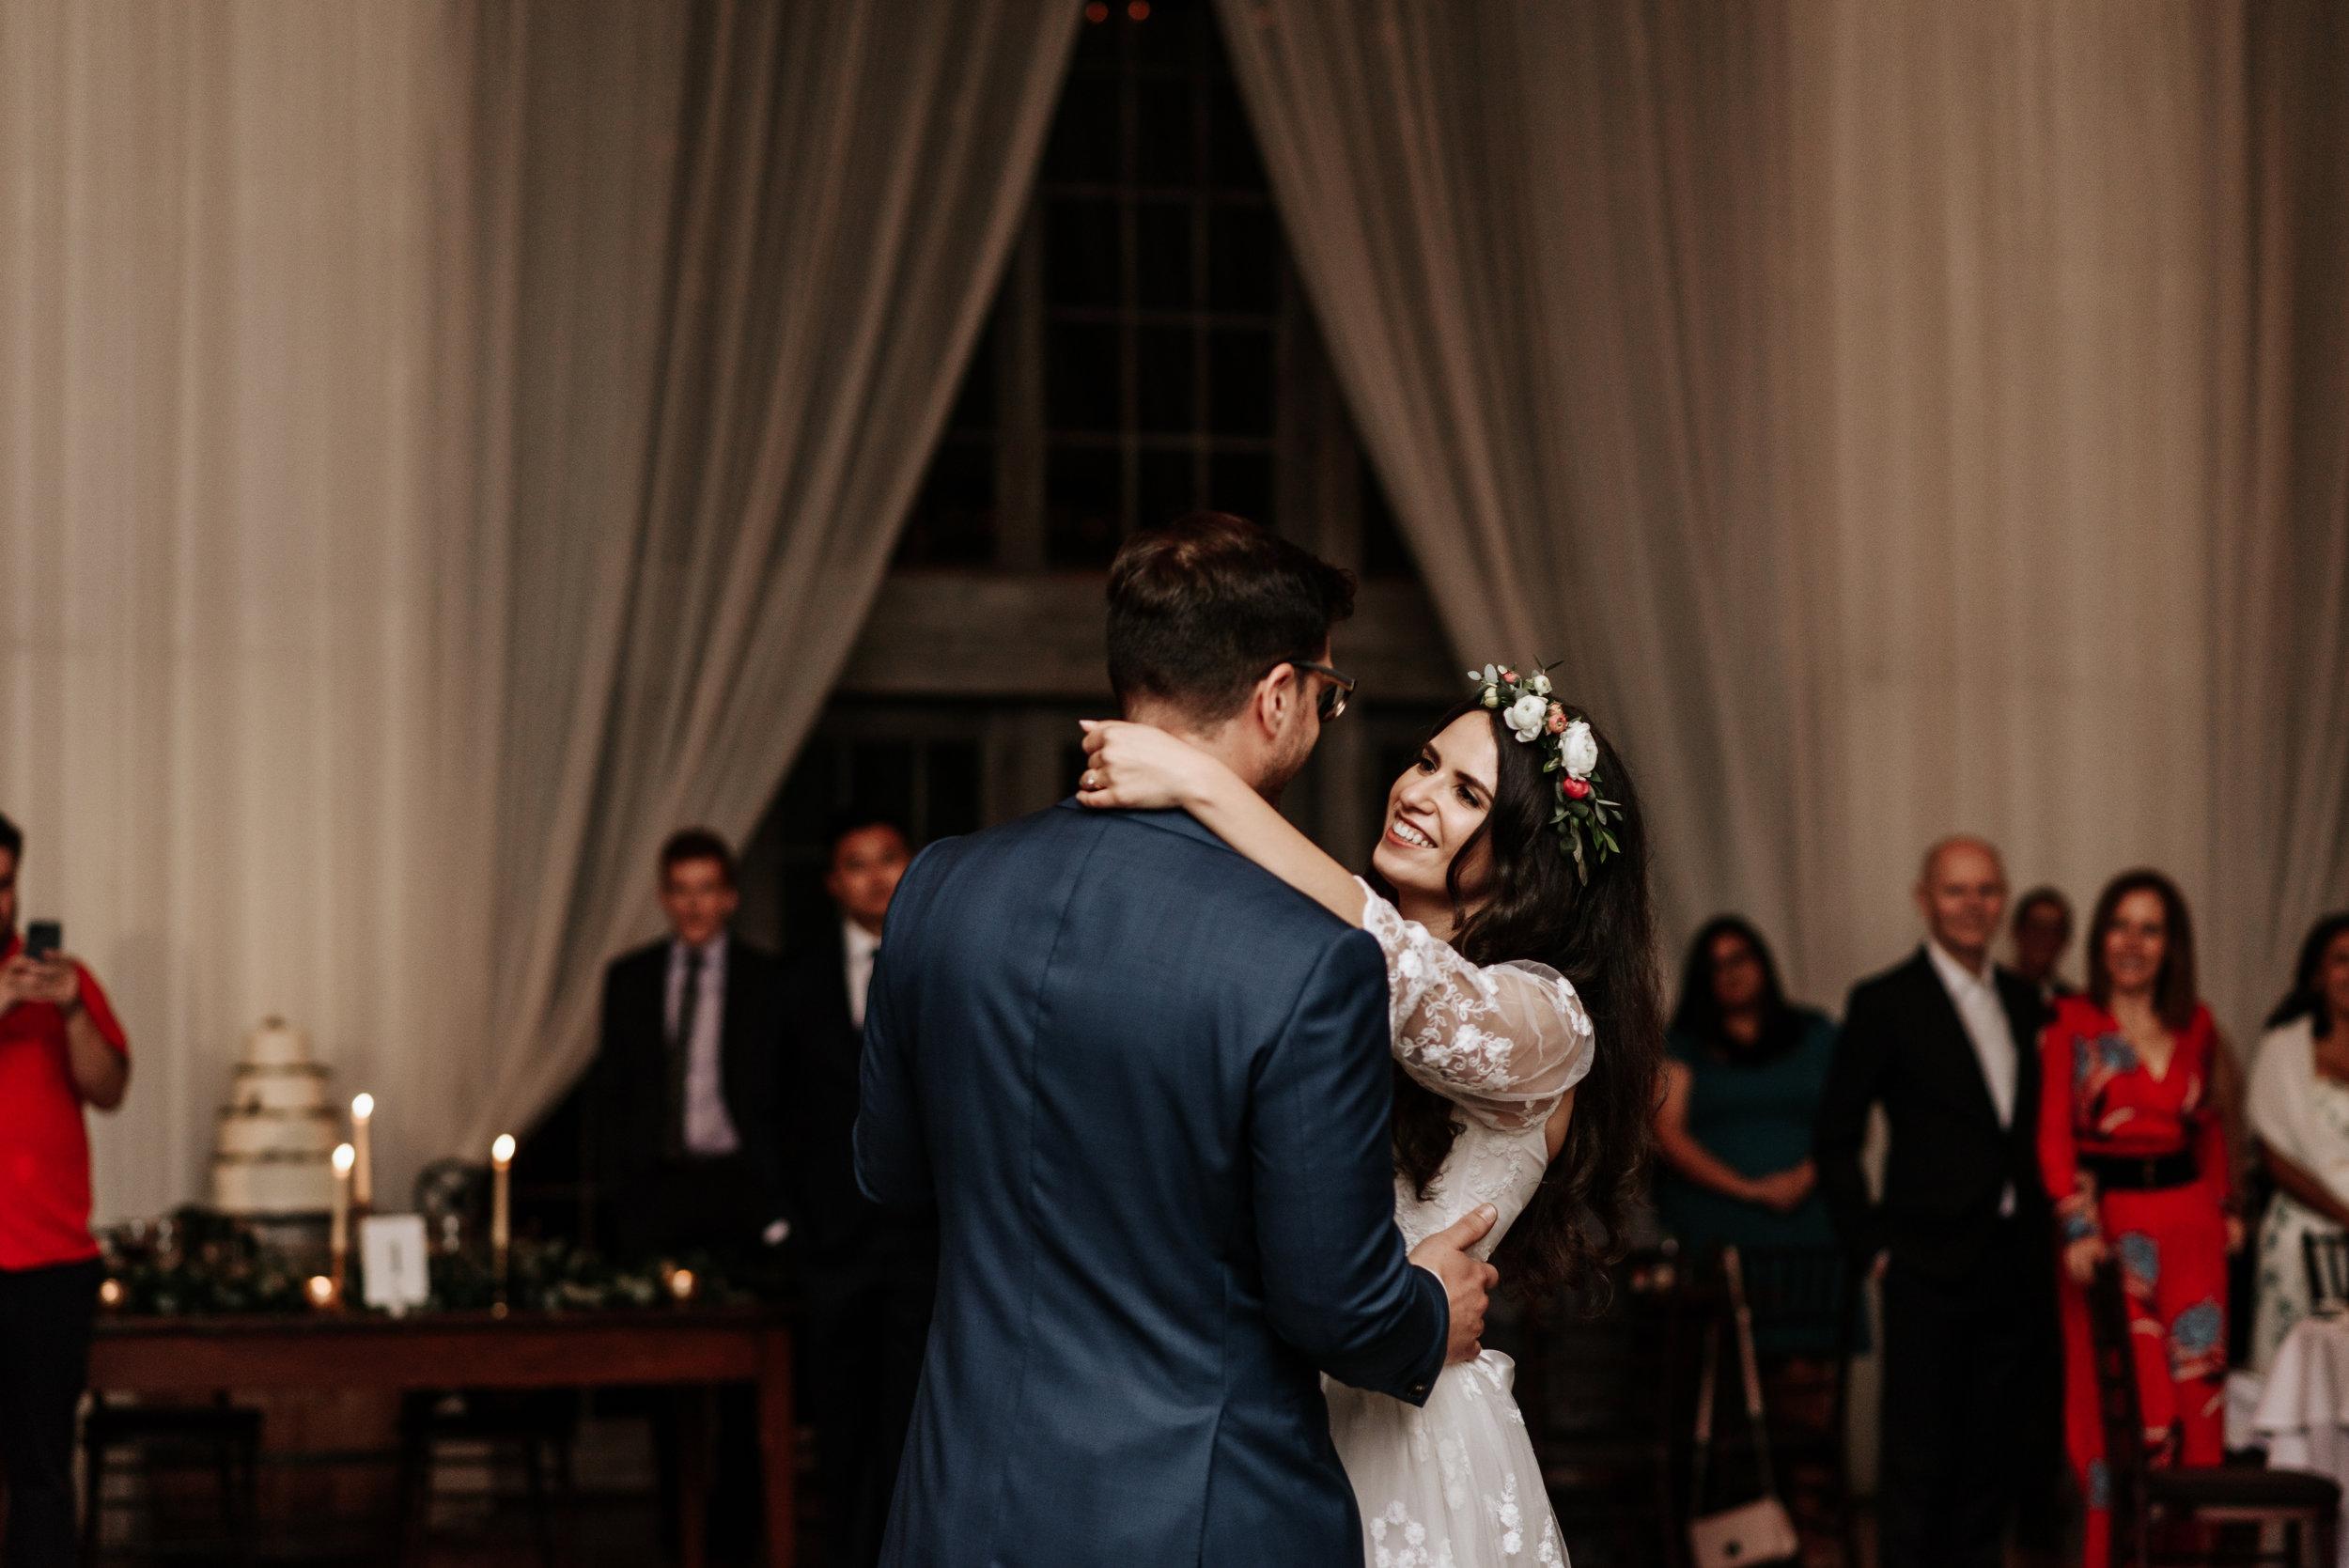 Veritas-Vineyards-and-Winery-Wedding-Photography-Afton-Virginia-Yasmin-Seth-Photography-by-V-3014.jpg